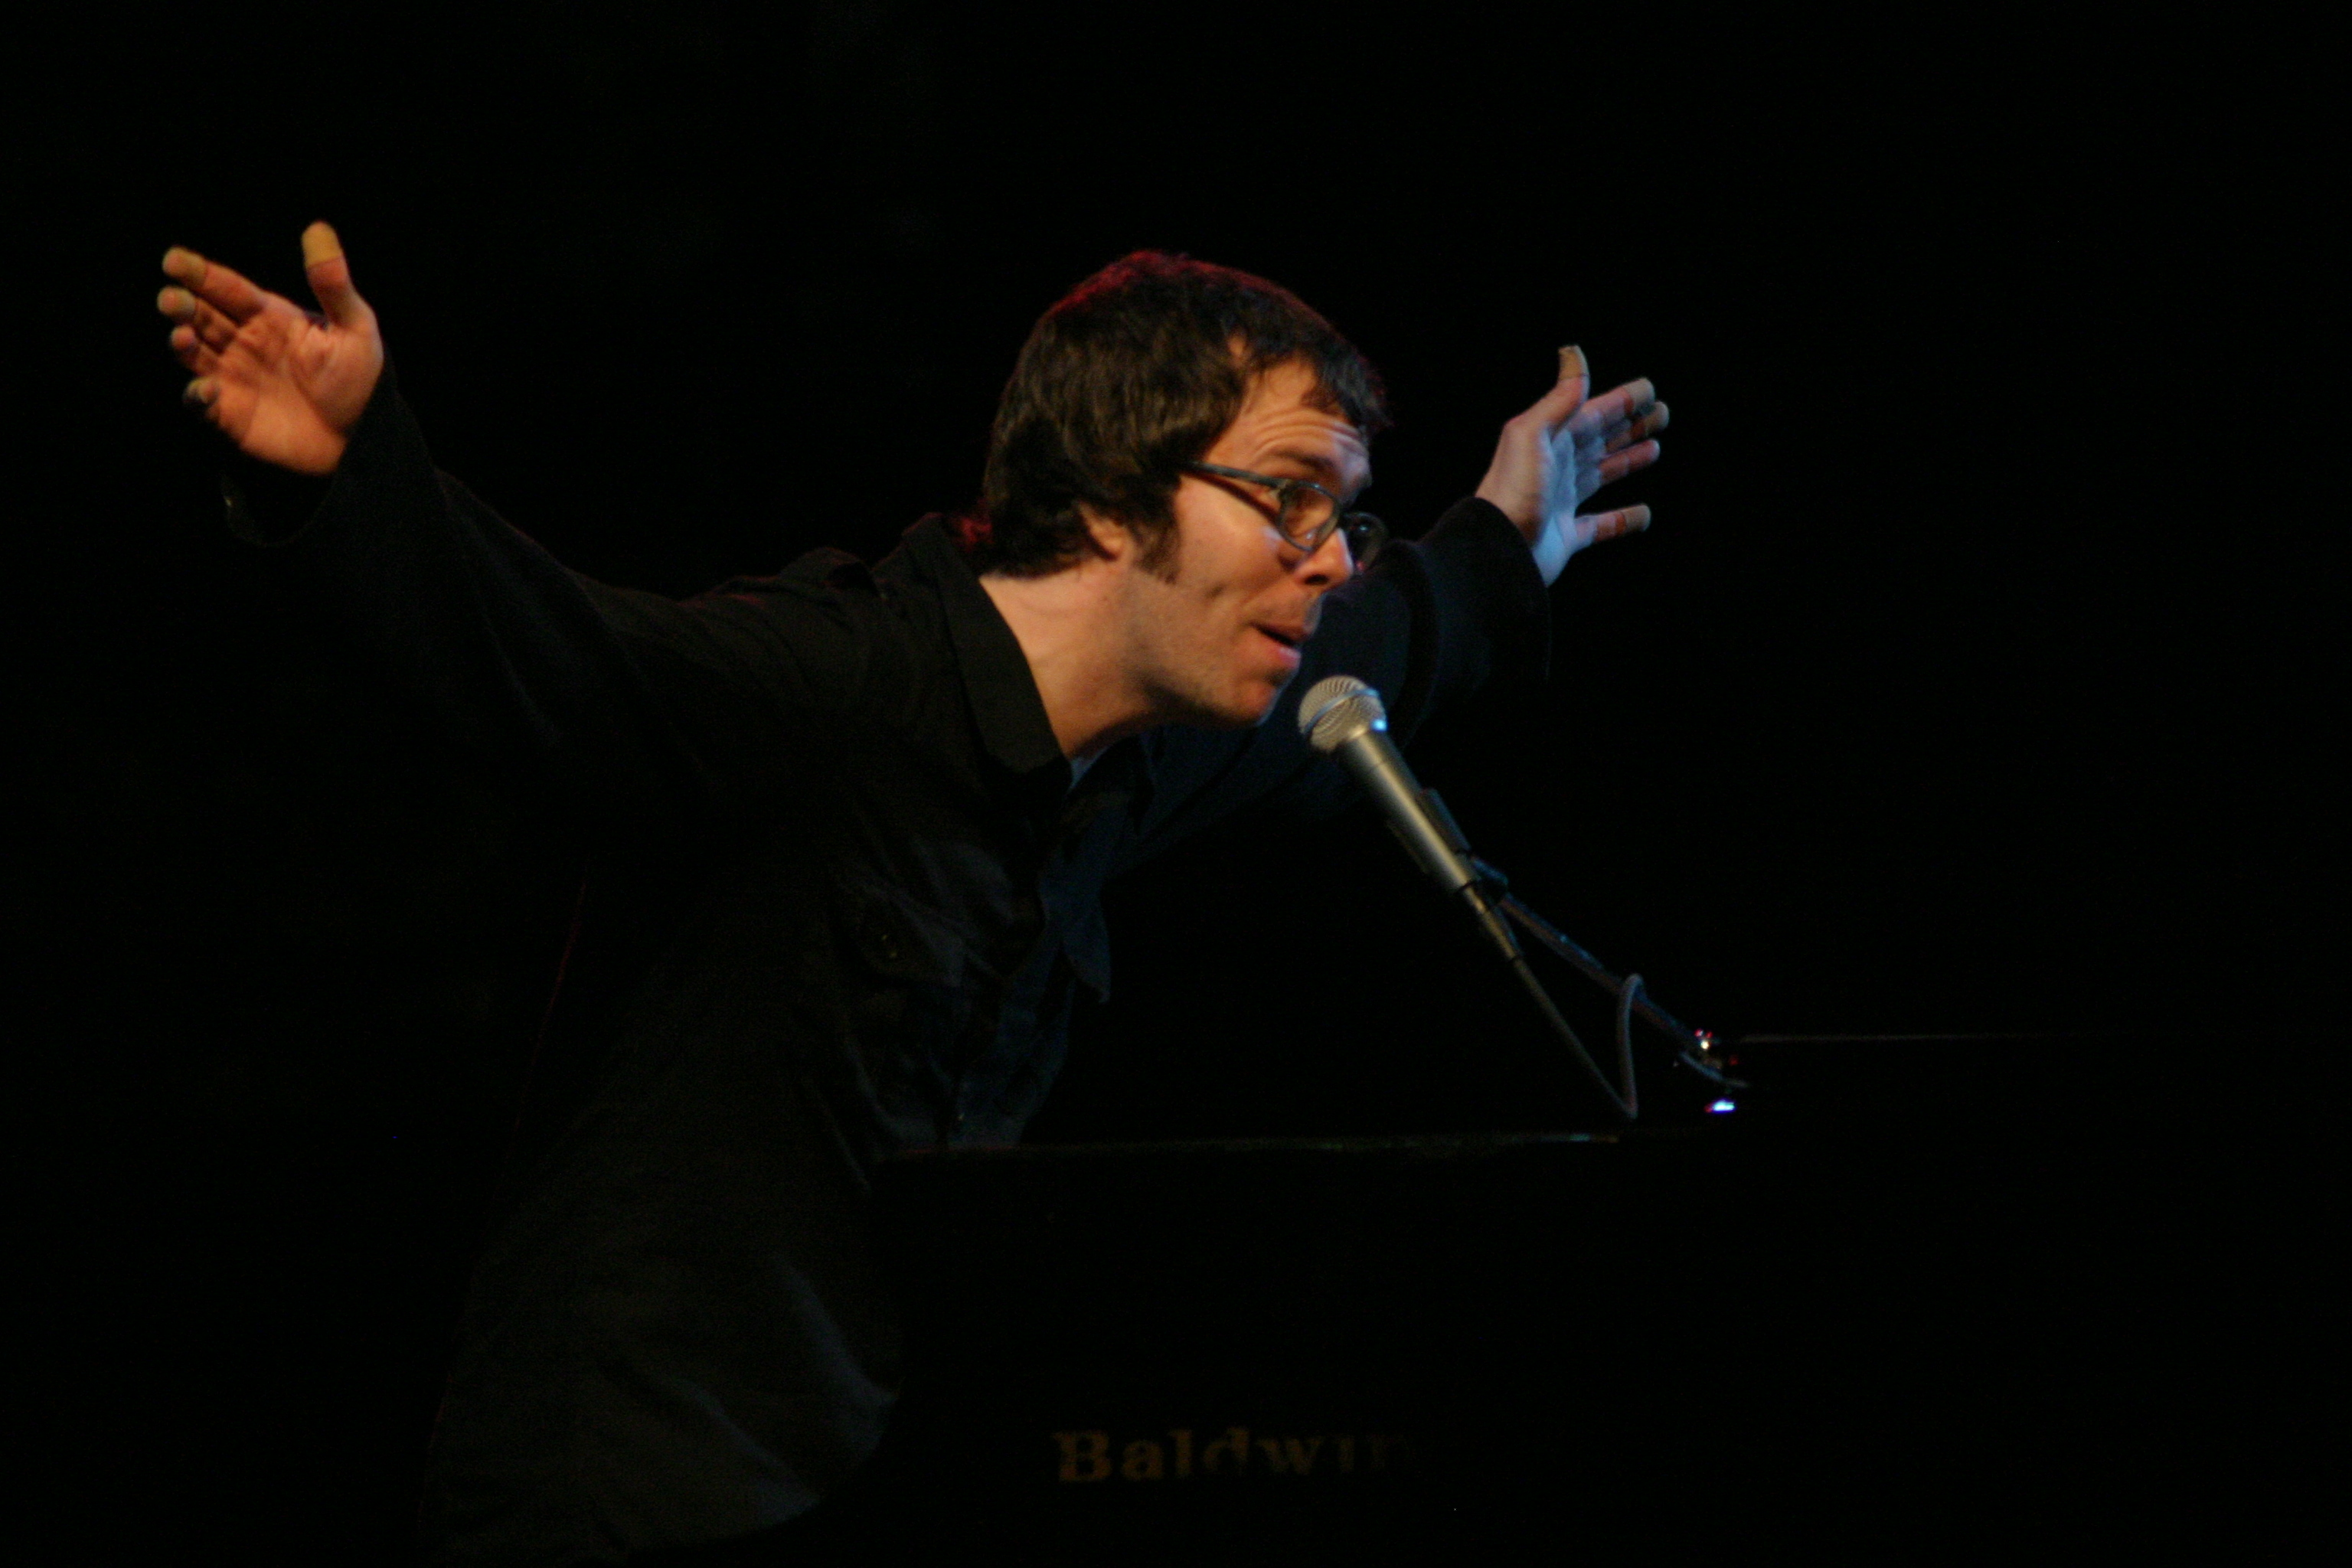 Ben Folds Photo